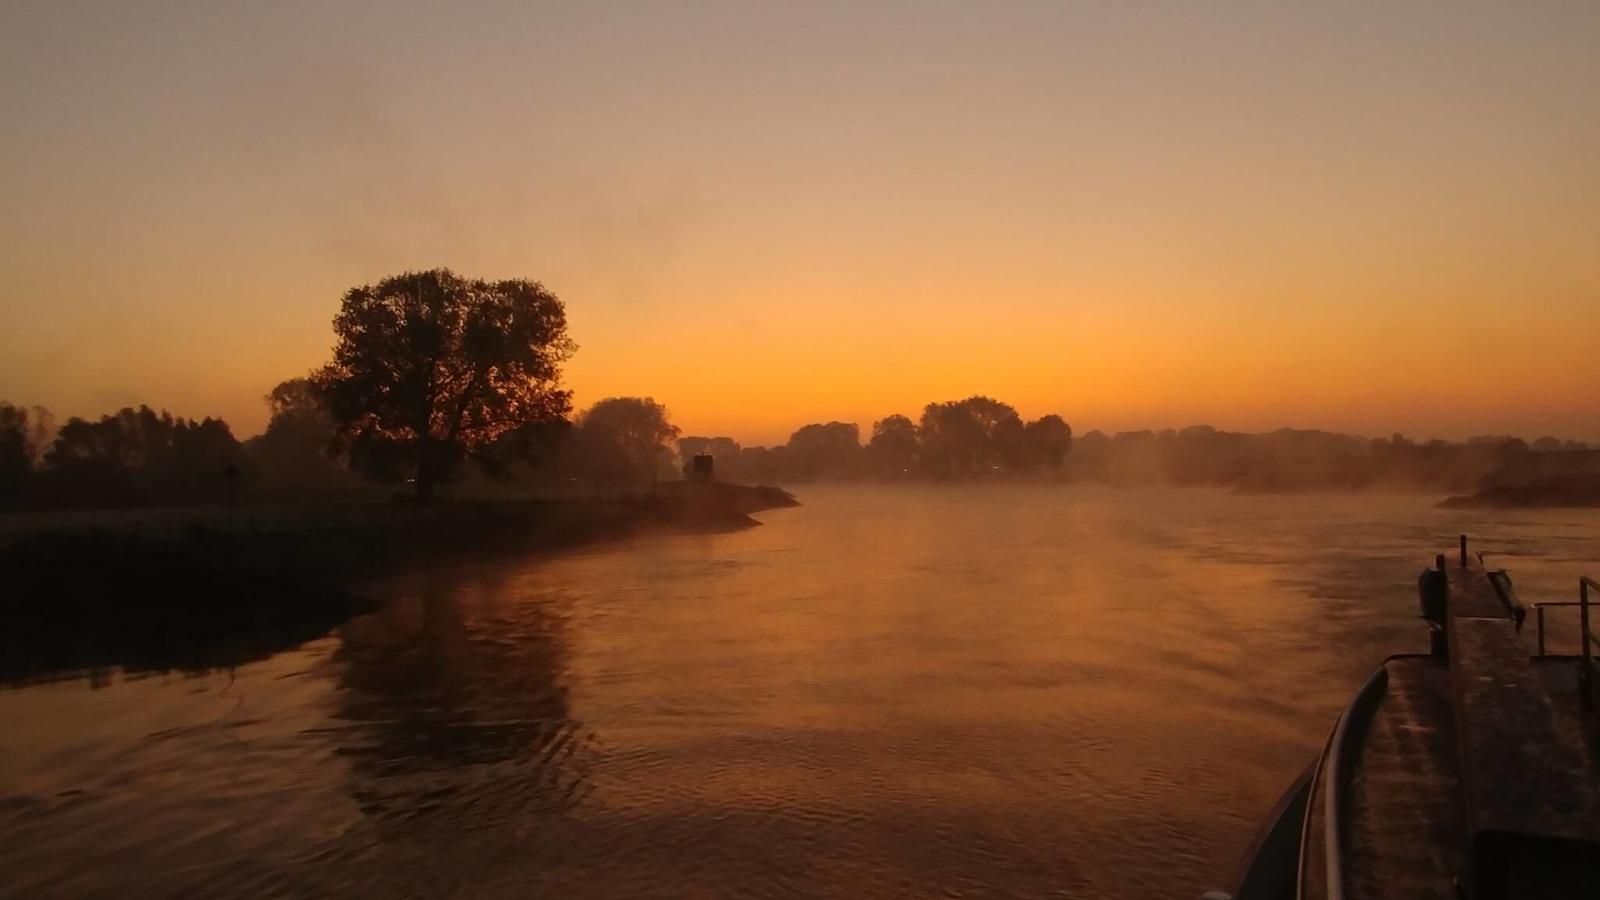 Туман над рекой Эйссел. Фото: Johan Klos/NOS Ooggetuige.